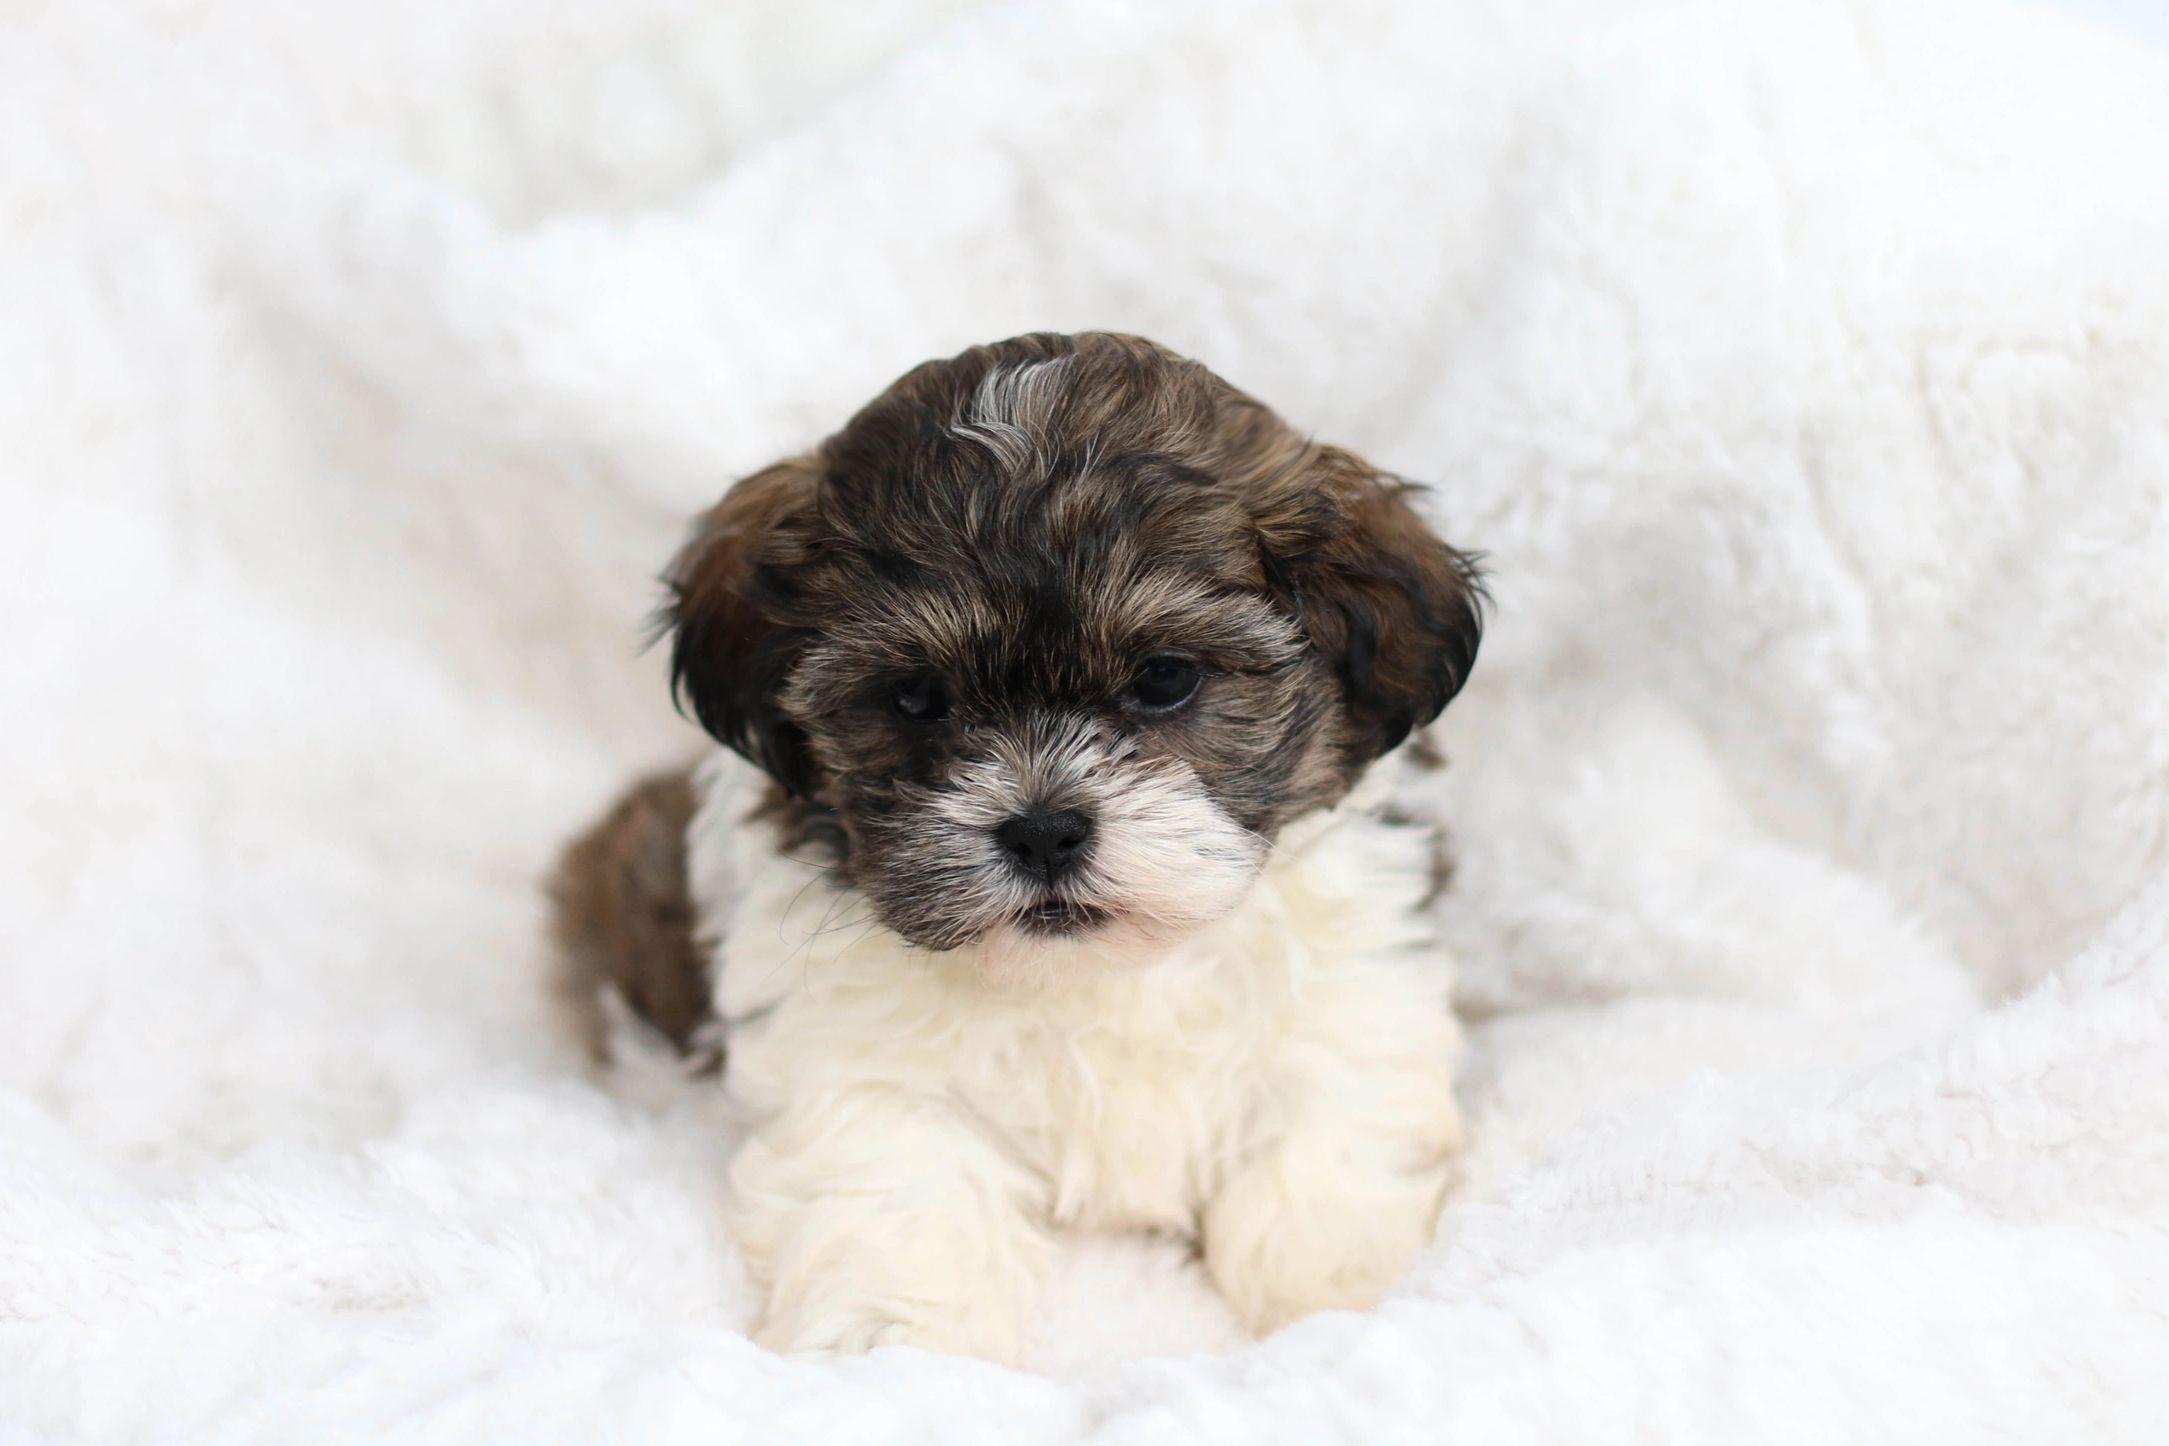 Teddy Bear Shichon Puppies For Sale Stonyridge Puppies Teddy Bear Shichon Puppies For Sale S In 2020 Zuchon Puppies For Sale Teddy Bear Puppies Puppies For Sale